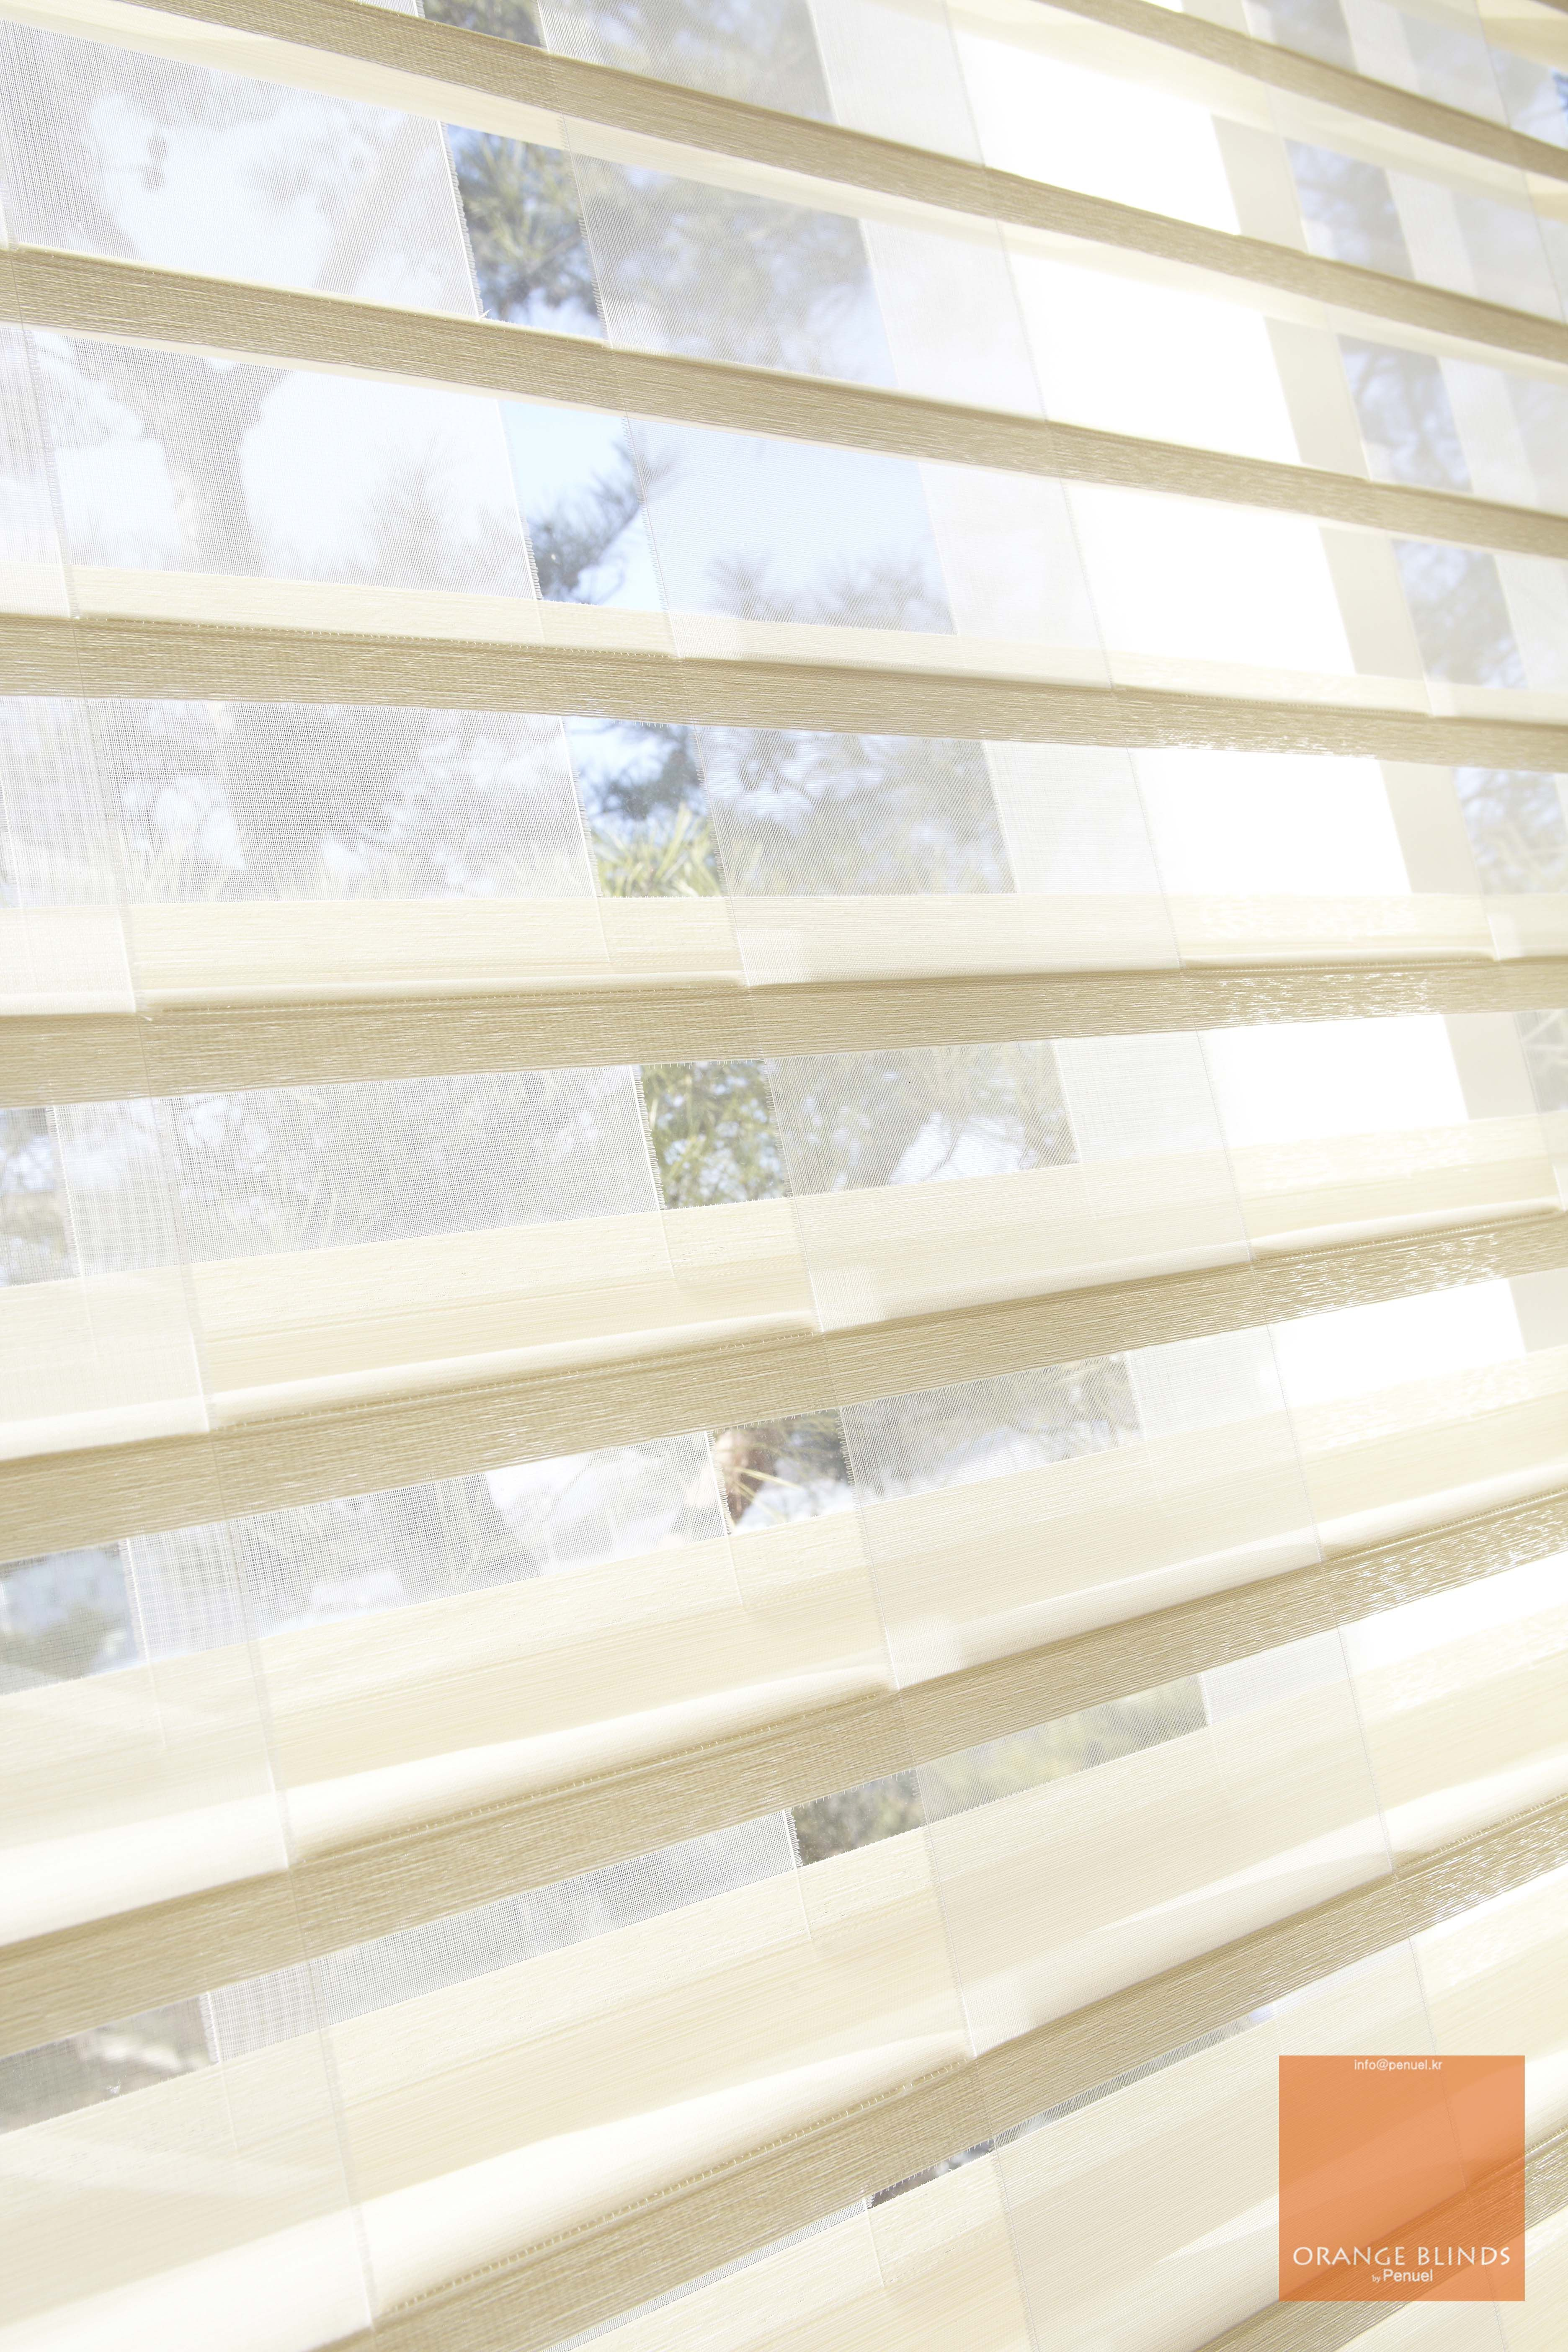 near backlit s blinds silhouette srgb pexels dl free blur window photo stock cs man white download dark